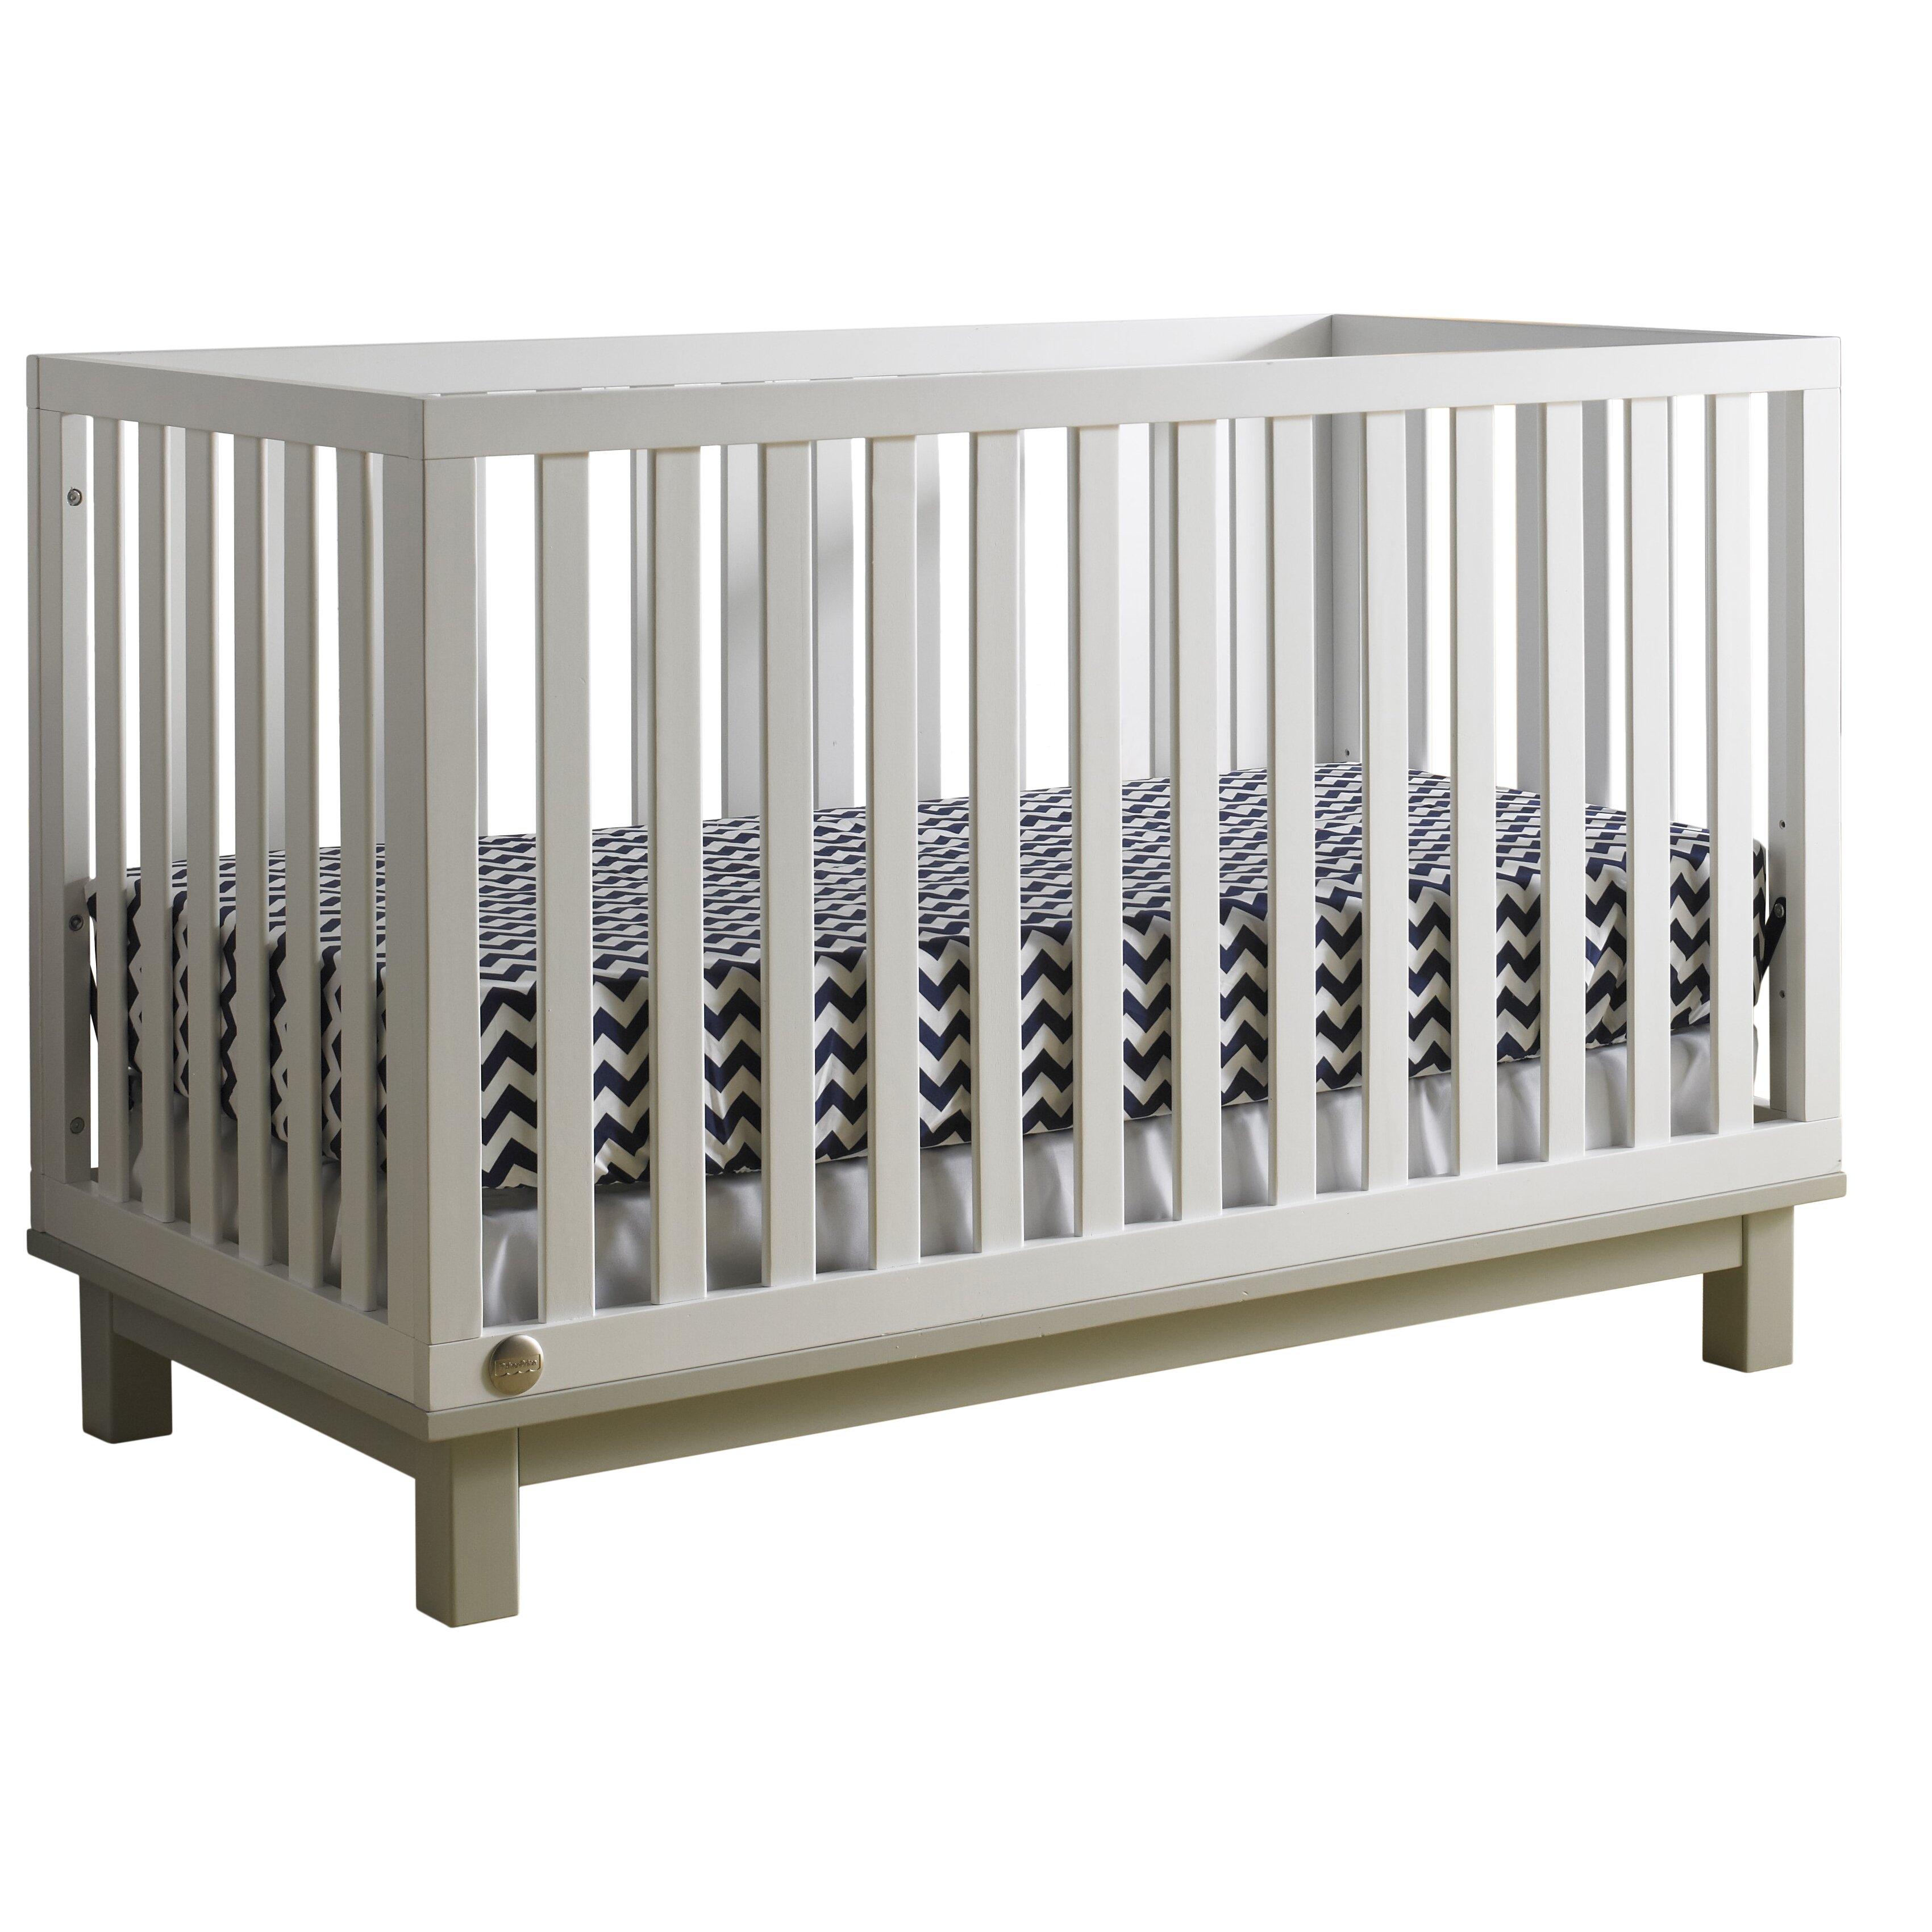 Crib for sale - Grey Crib For Sale Fisher Price Riley Island 3 In 1 Convertible Crib